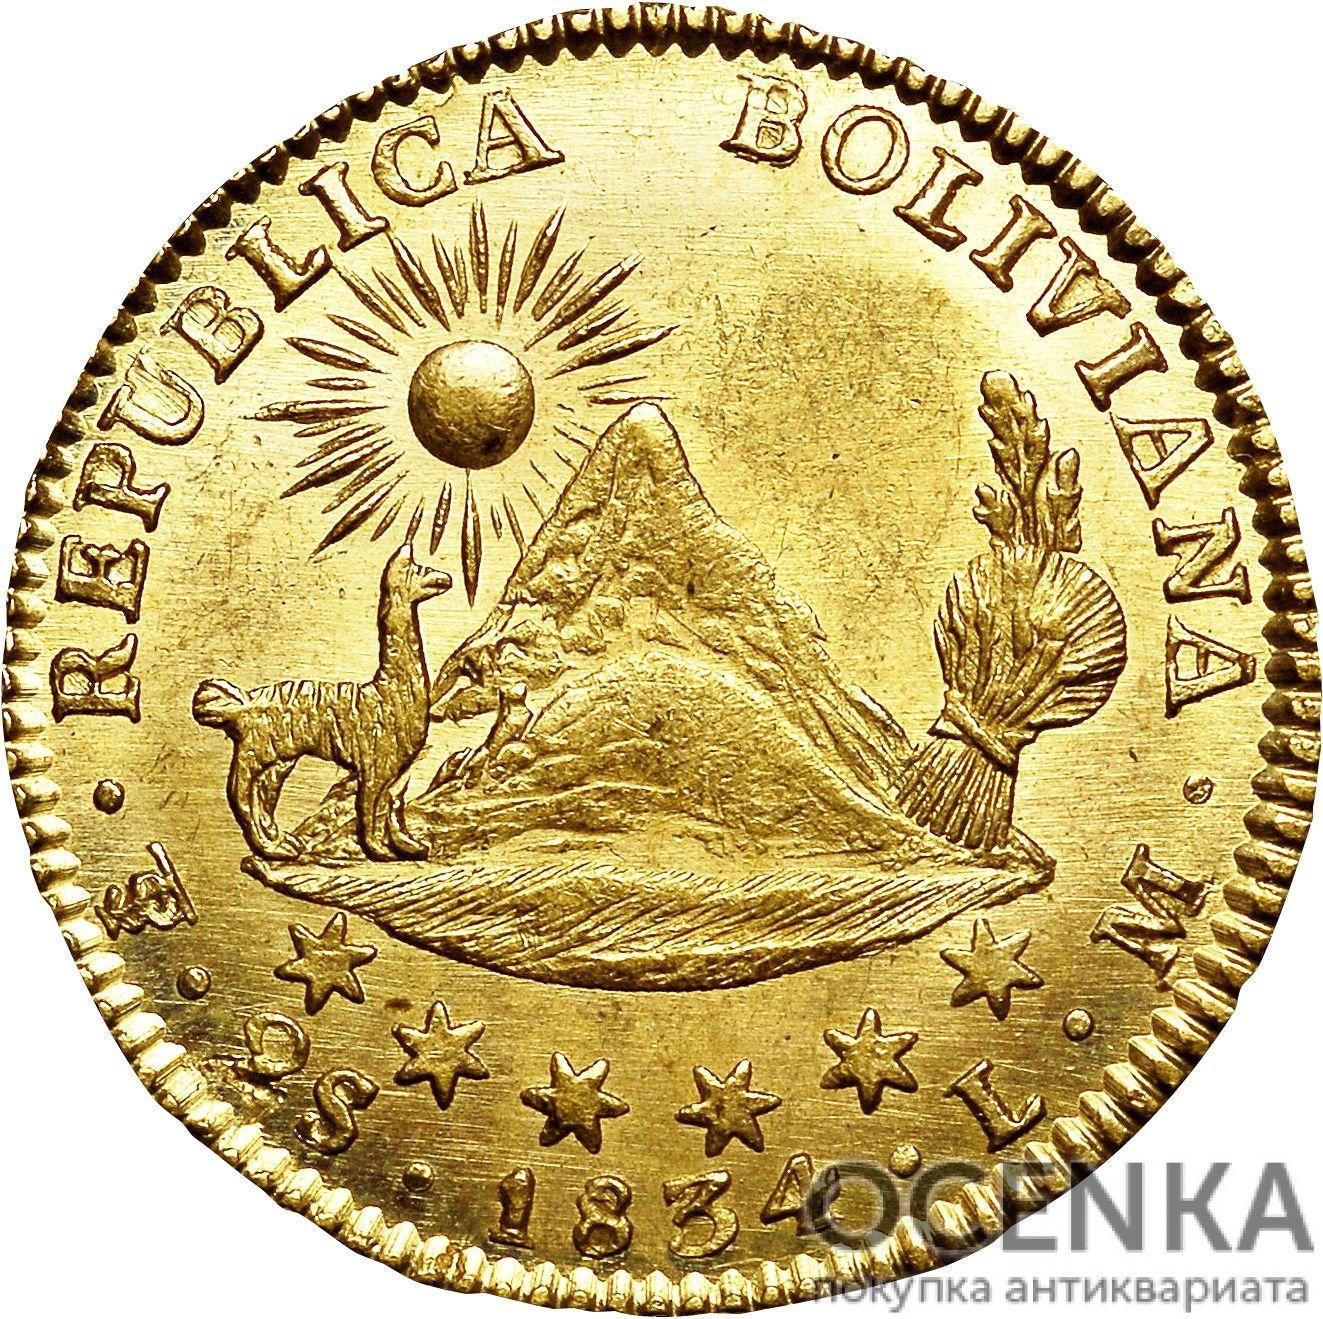 Золотая монета 2 скудо (2 Scudos) Боливия